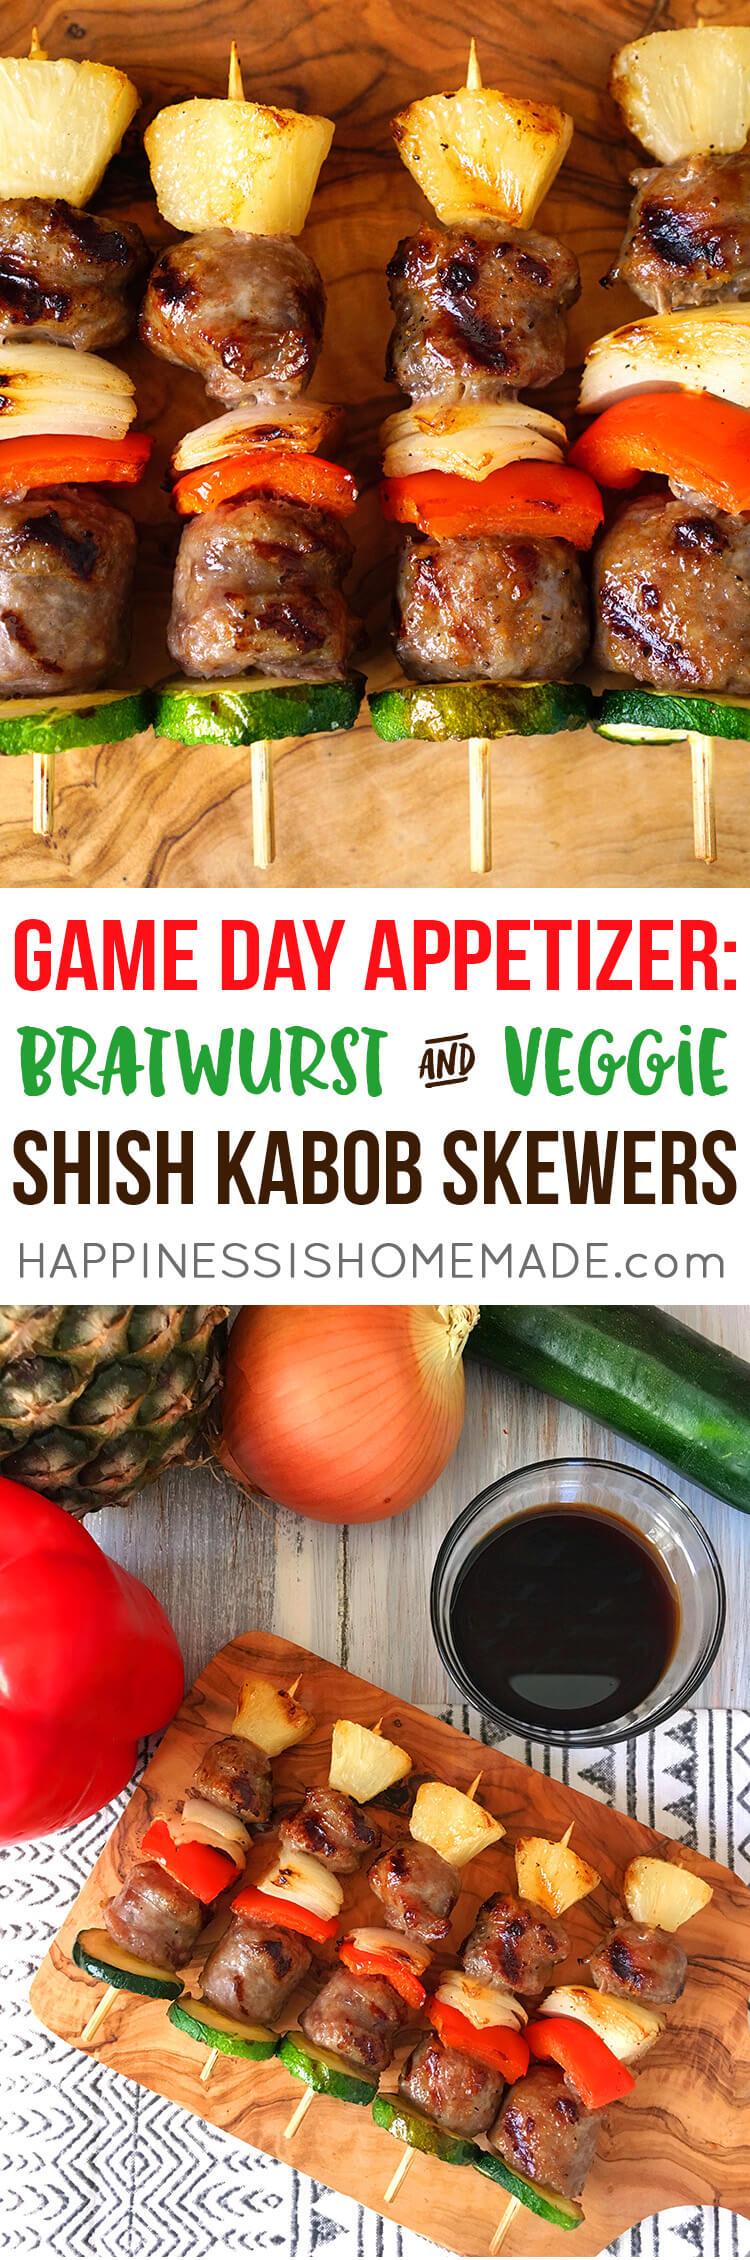 Game Day Appetizer - Bratwurst and Veggie Shish Kabob Skewers